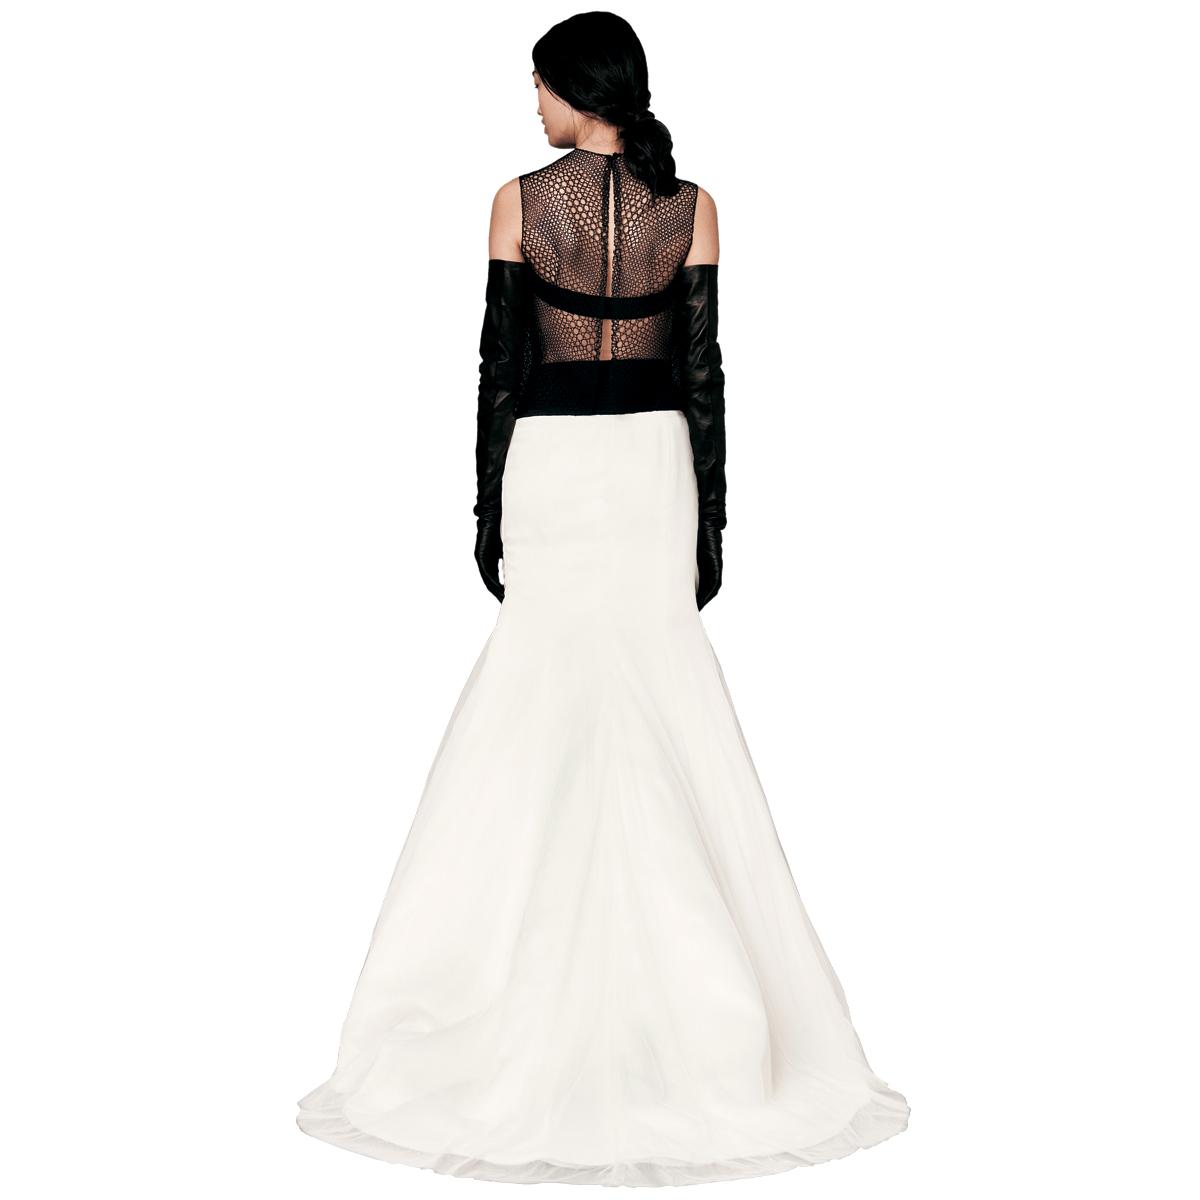 black-and-white-wedding-dress-1